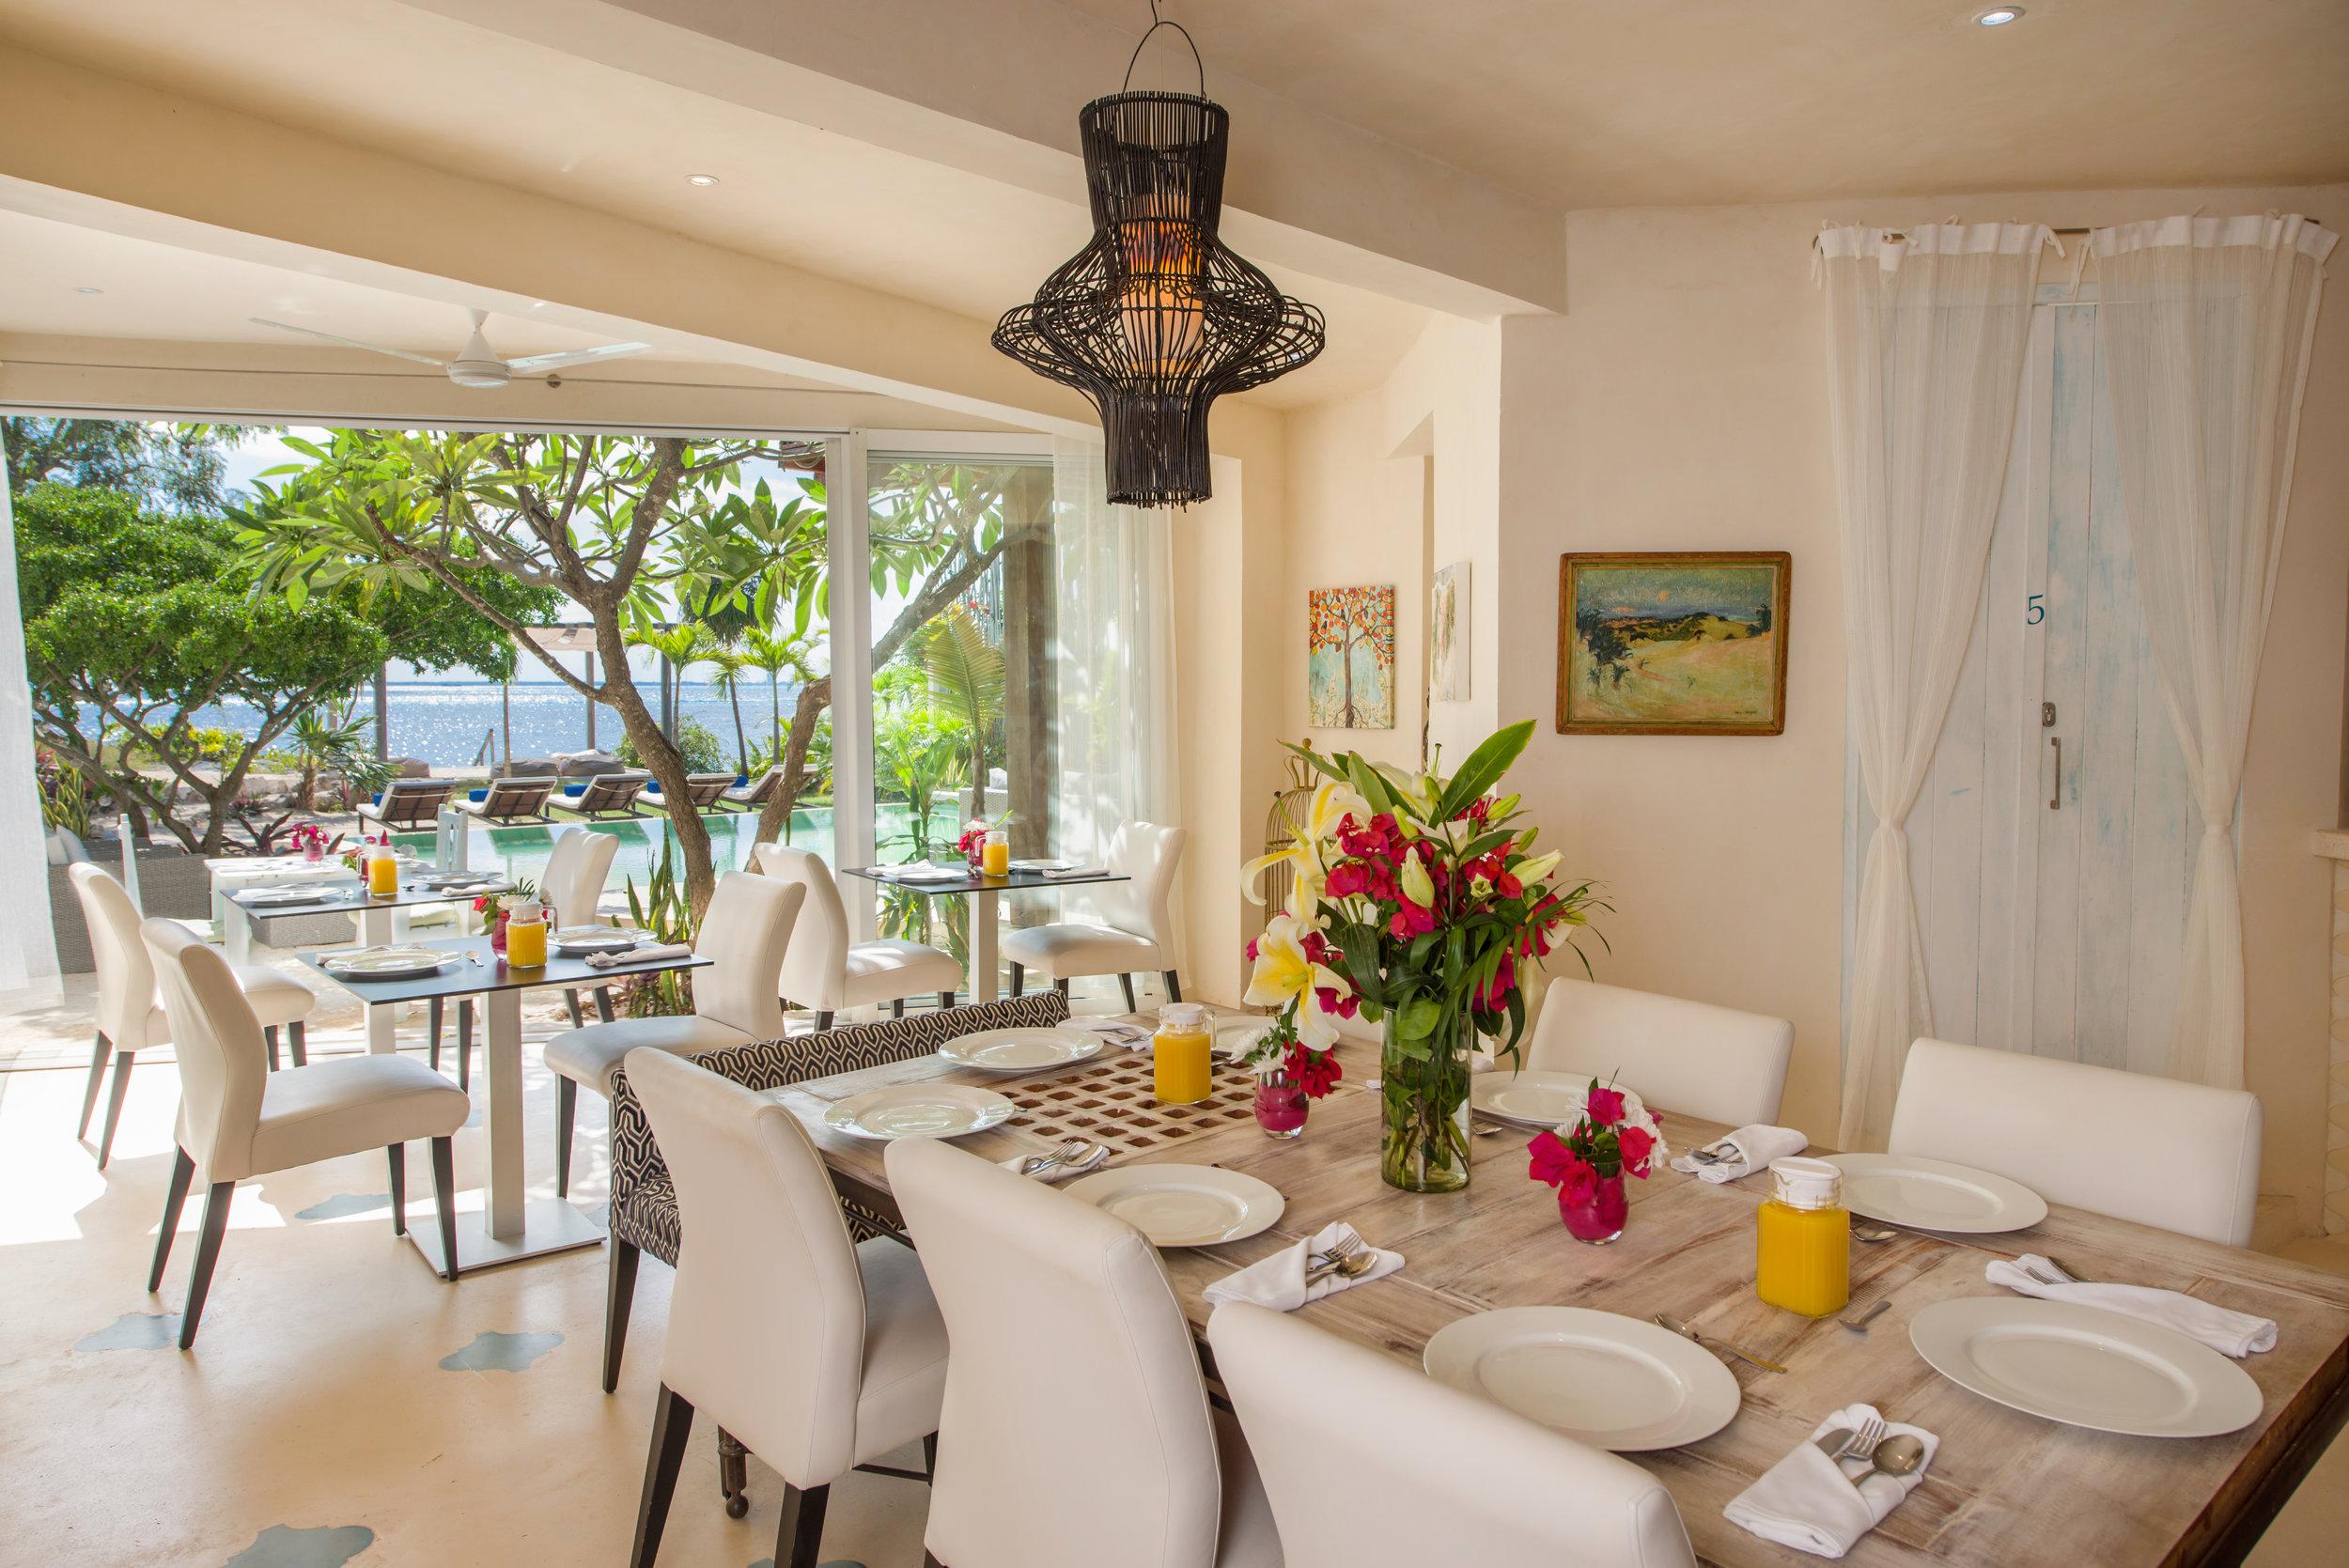 Casa Coco Isla Mujeres-7016.jpg